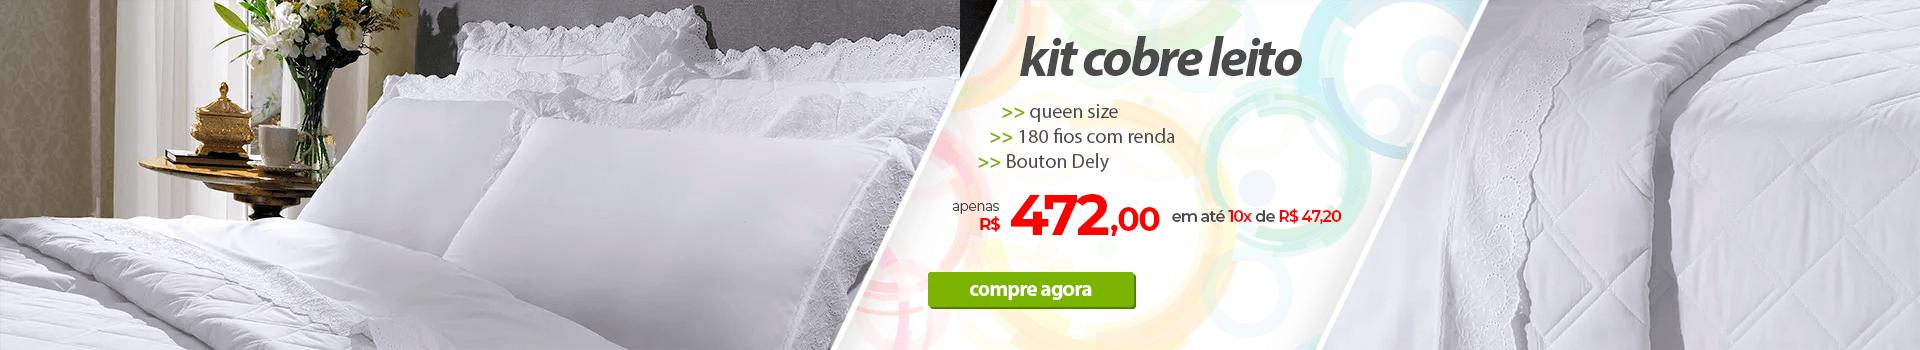 Kit Cobre Leito Queen Size 180 Fios Bouton Dely   Apenas R$472,00   Loja Buettner   Compre Agora!